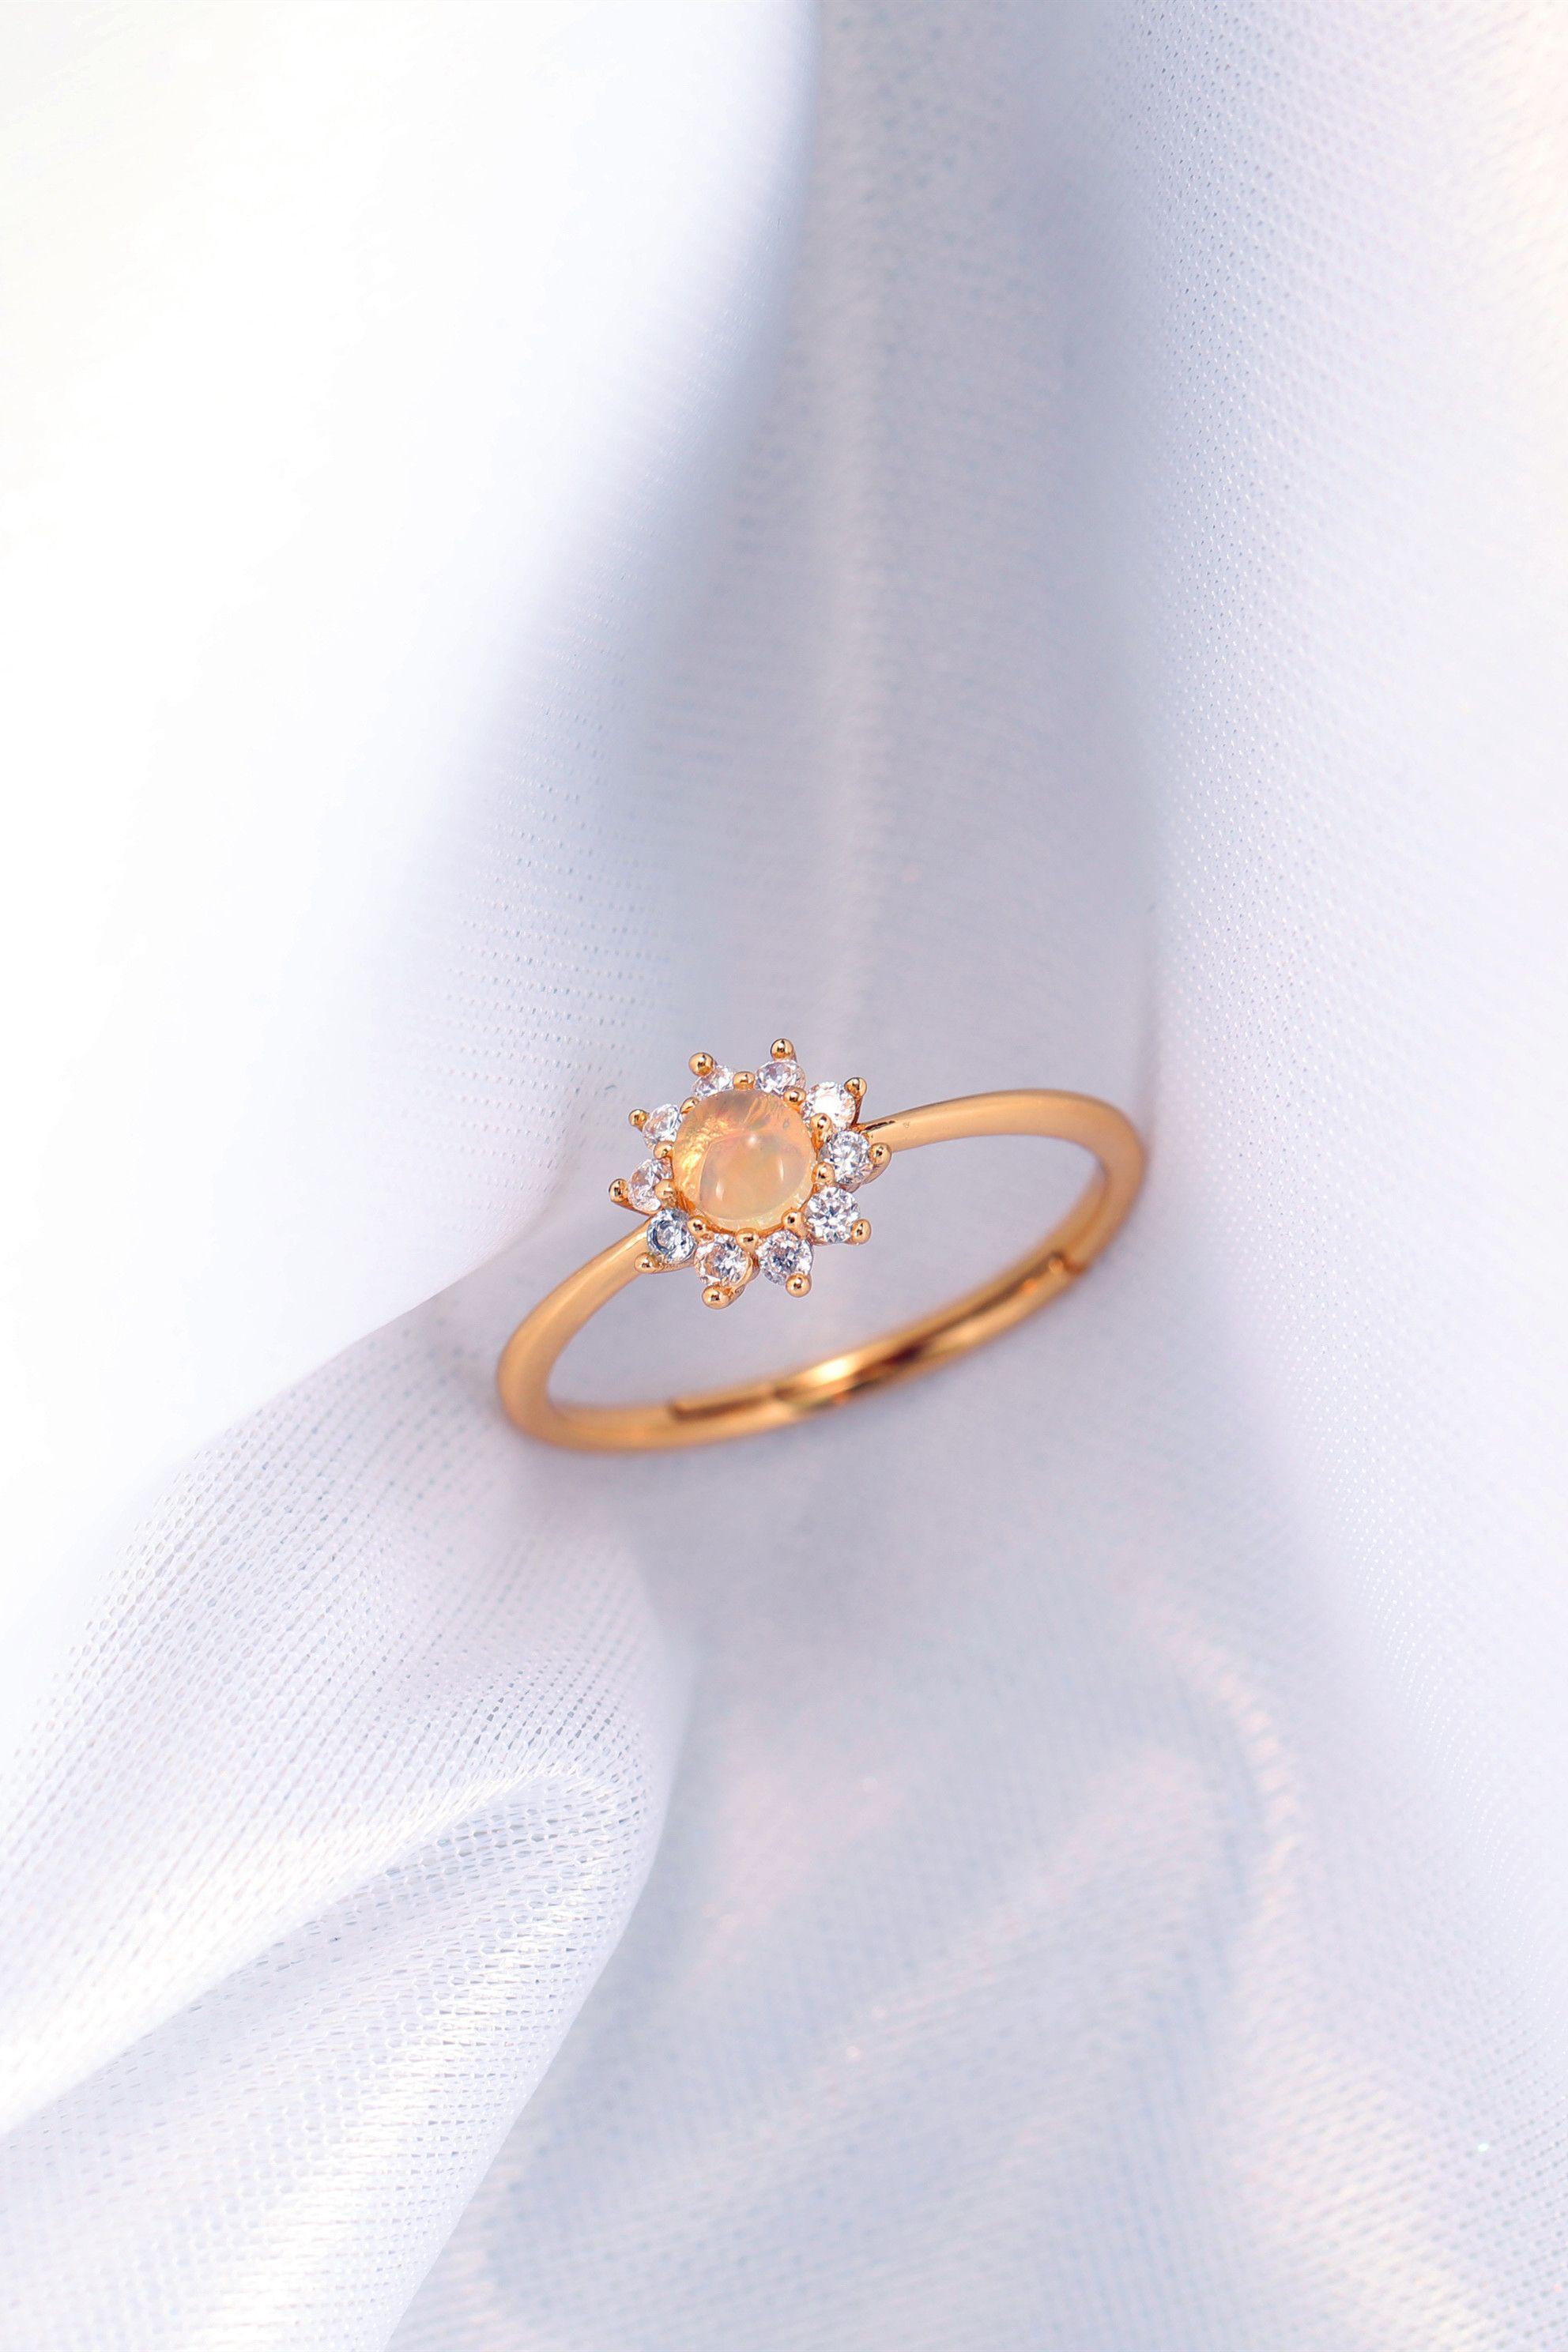 Natural Opal Sunflower Rings Adjustable